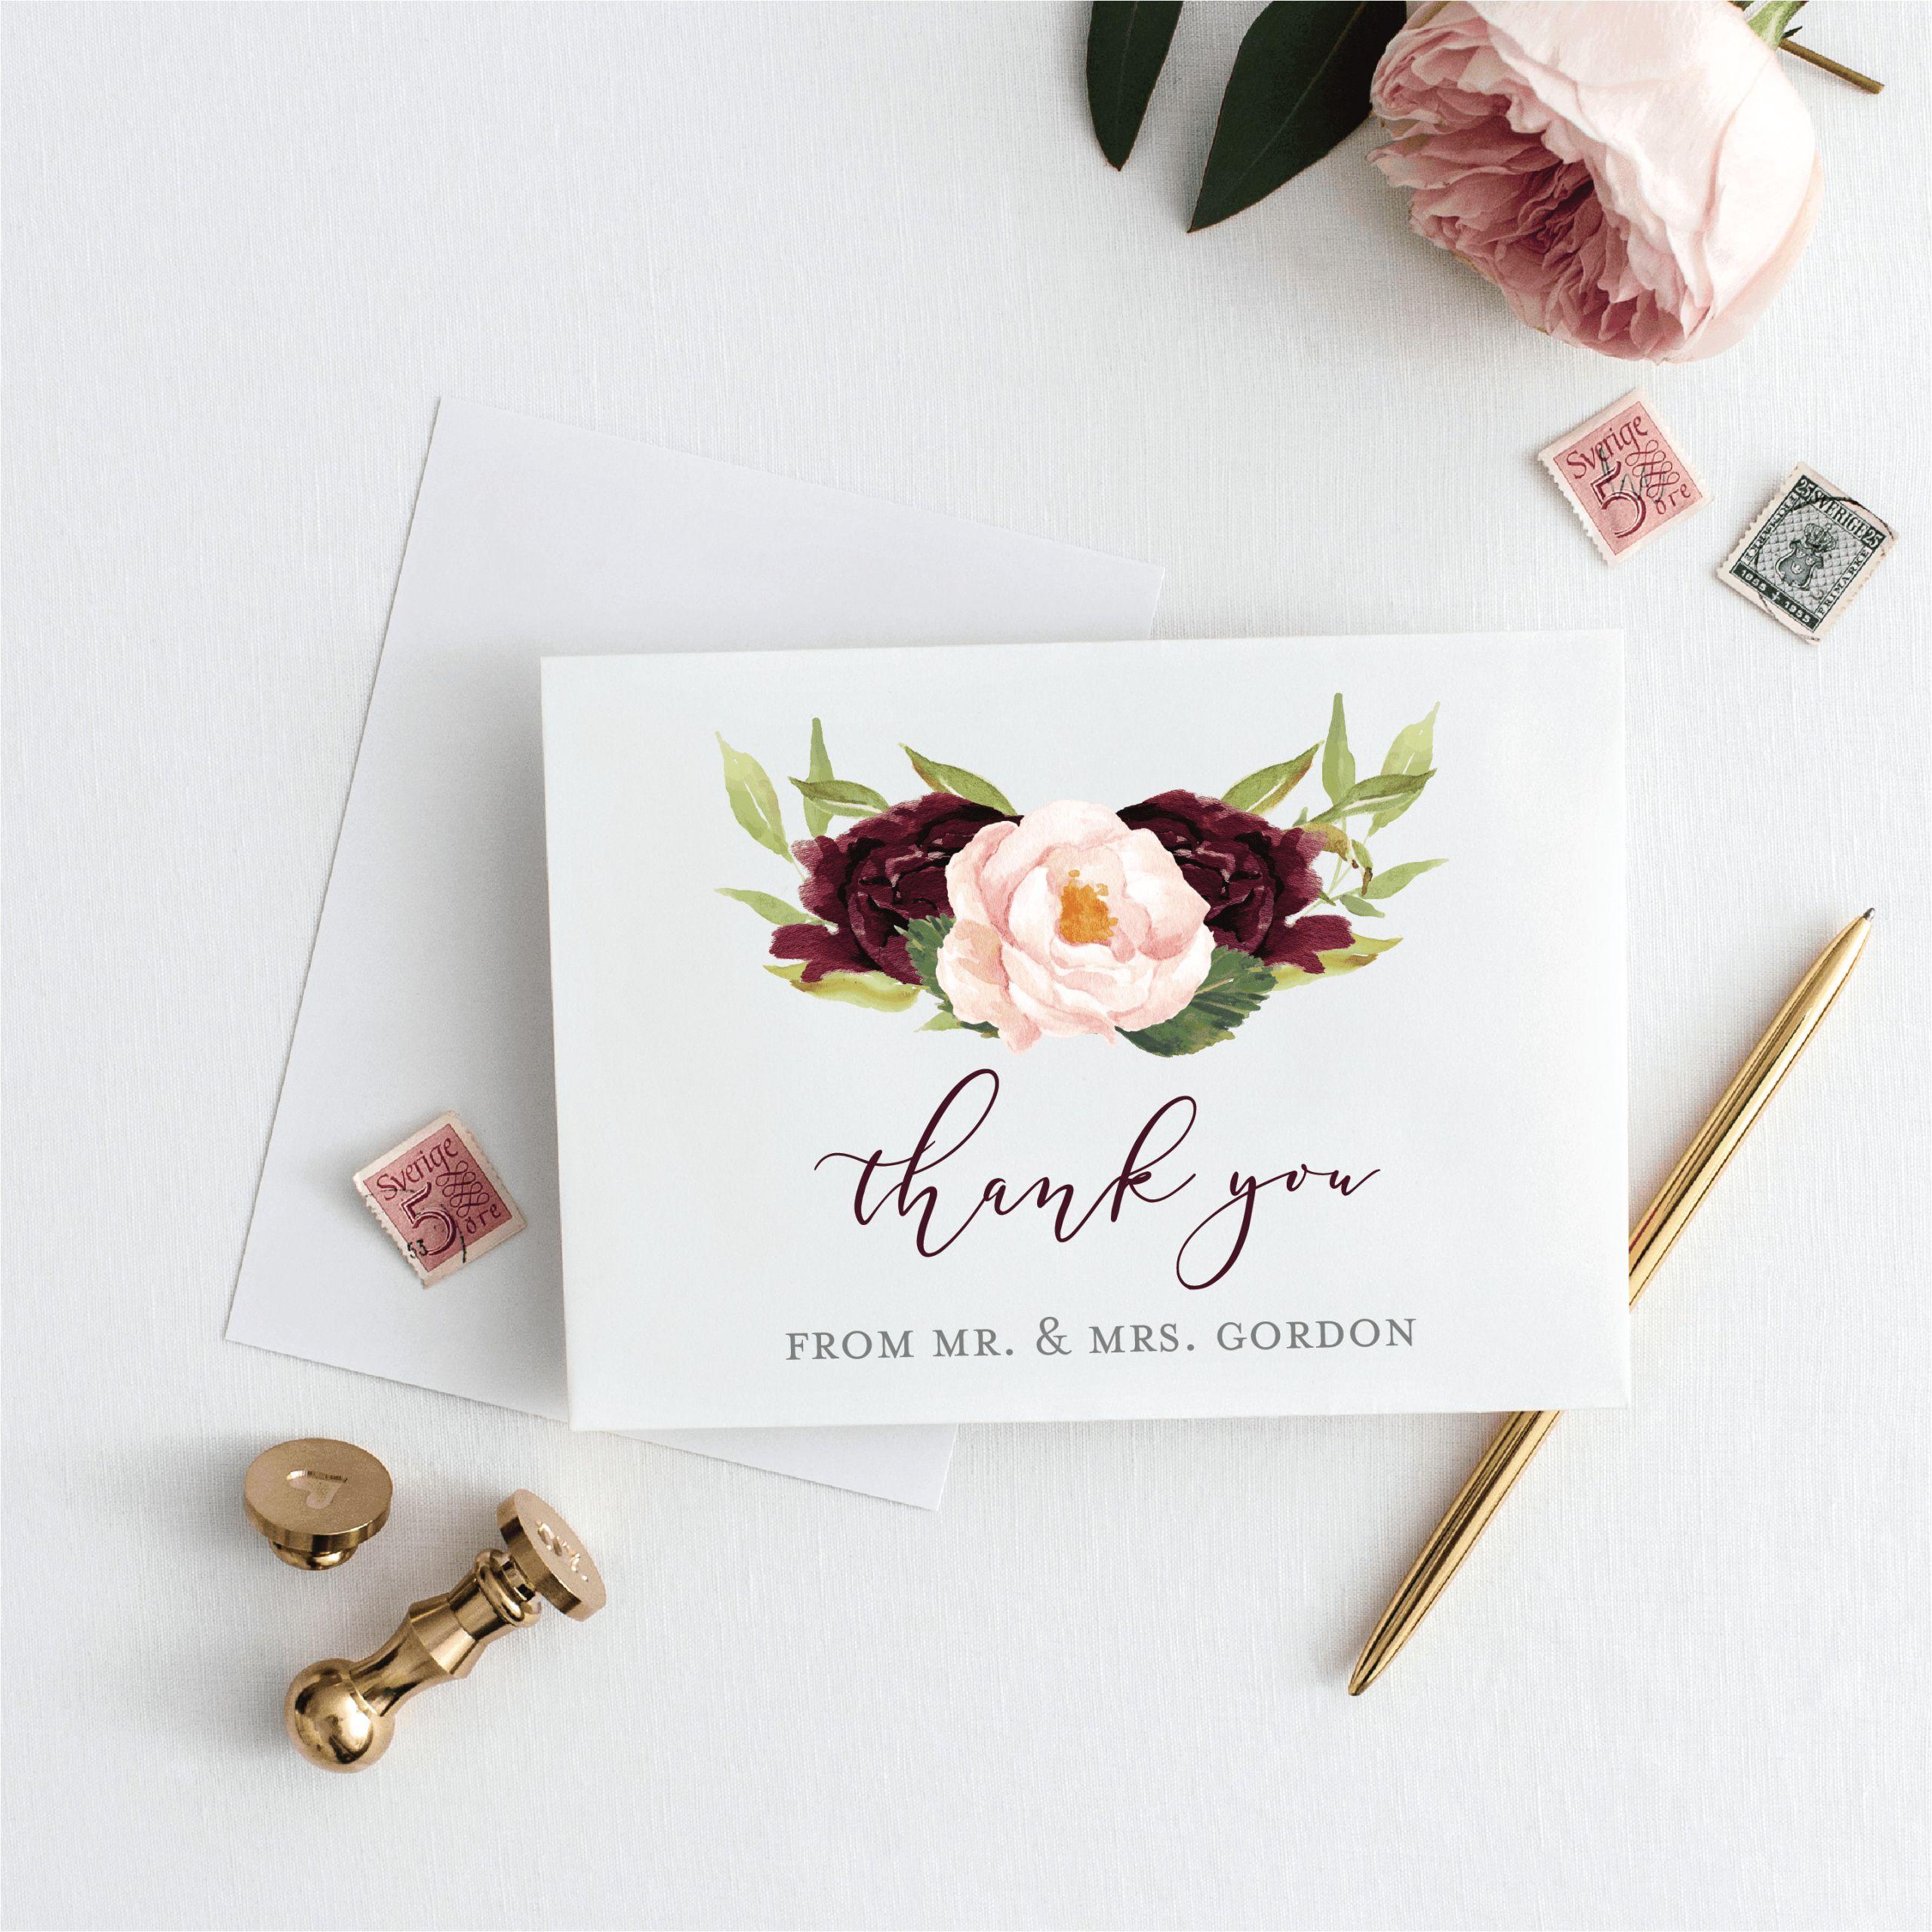 thank you card the devon wedding collectionwedding thank you cardrubi and lib design studio 25165671 2880x png